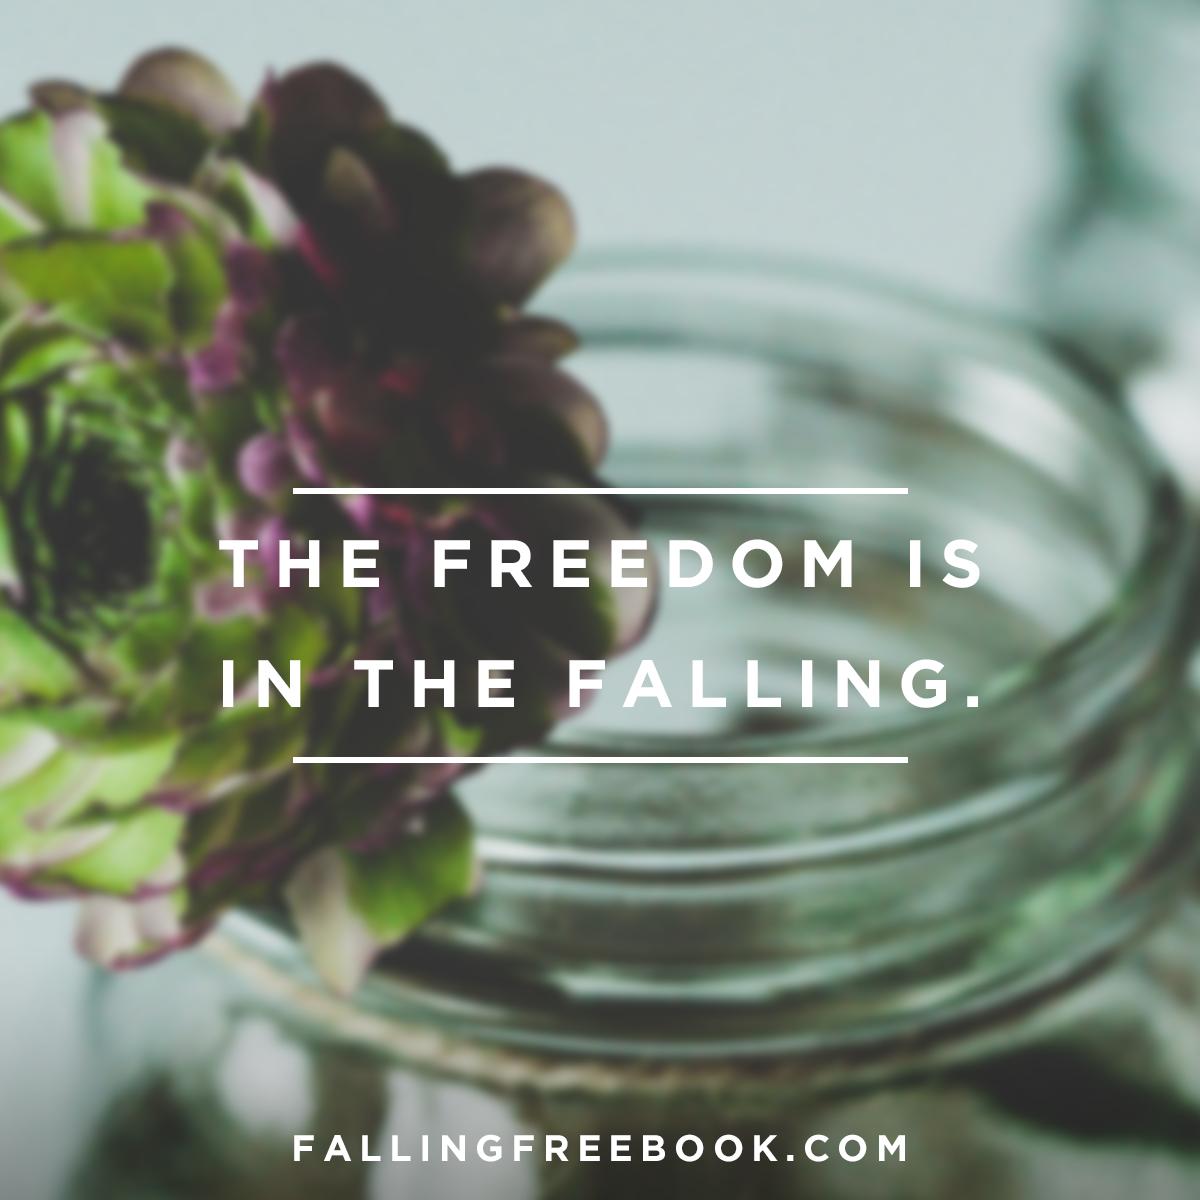 FallingFree_meme_freedom.png